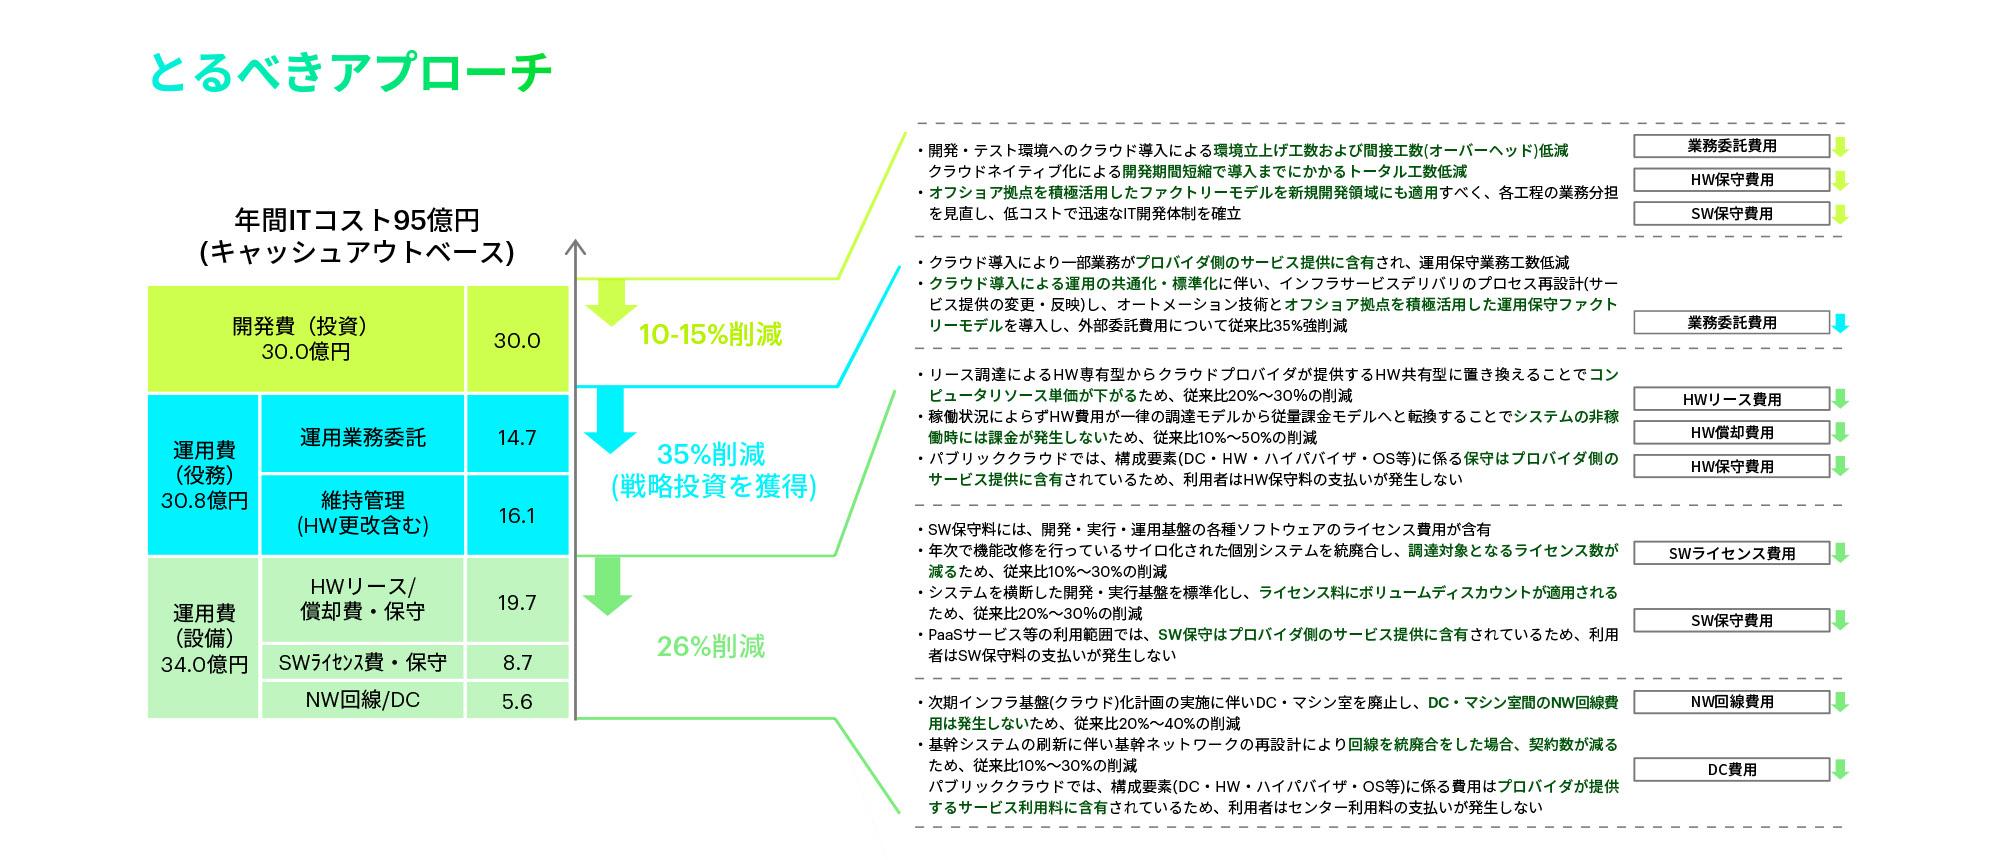 https://www.accenture.com/t00010101T000000Z__w__/jp-ja/_acnmedia/Accenture/Conversion-Assets/DotCom/Images/Local/ja-jp/5/Accenture-17-010764-Modernization-4Image4.jpgla=ja-JP